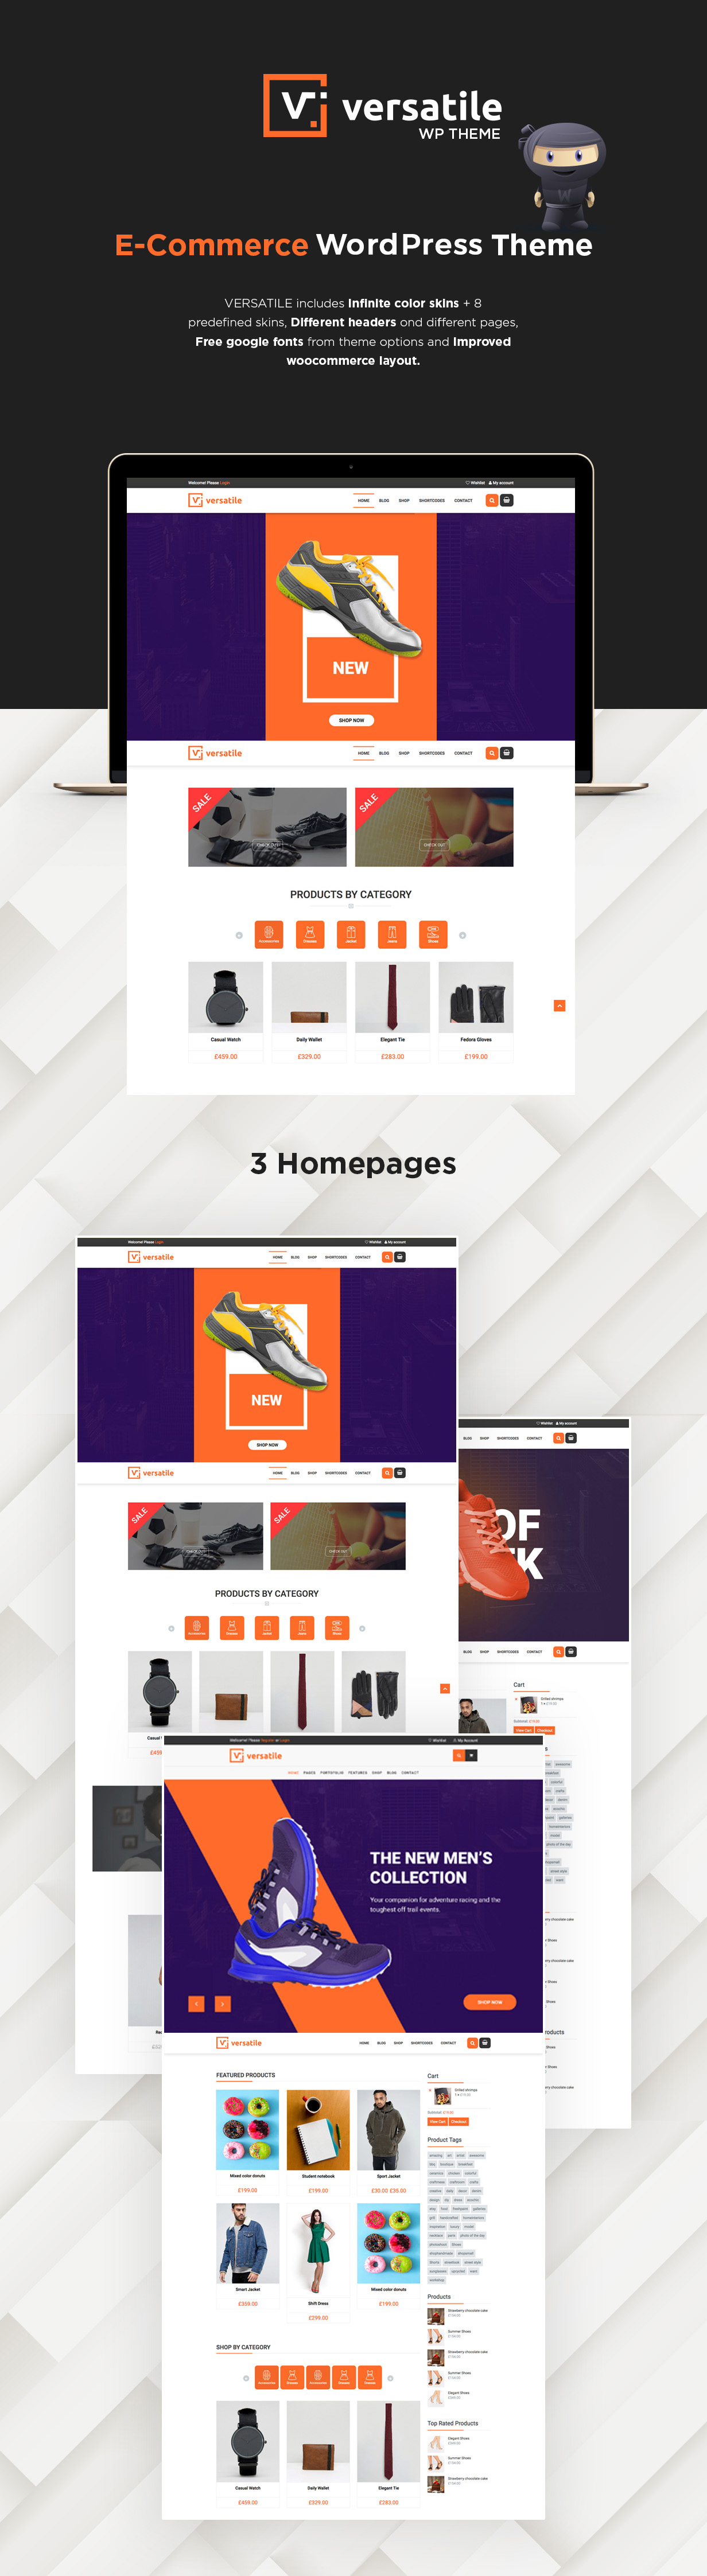 Versatile - Multipurpose WooCommerce WordPress Theme - 1